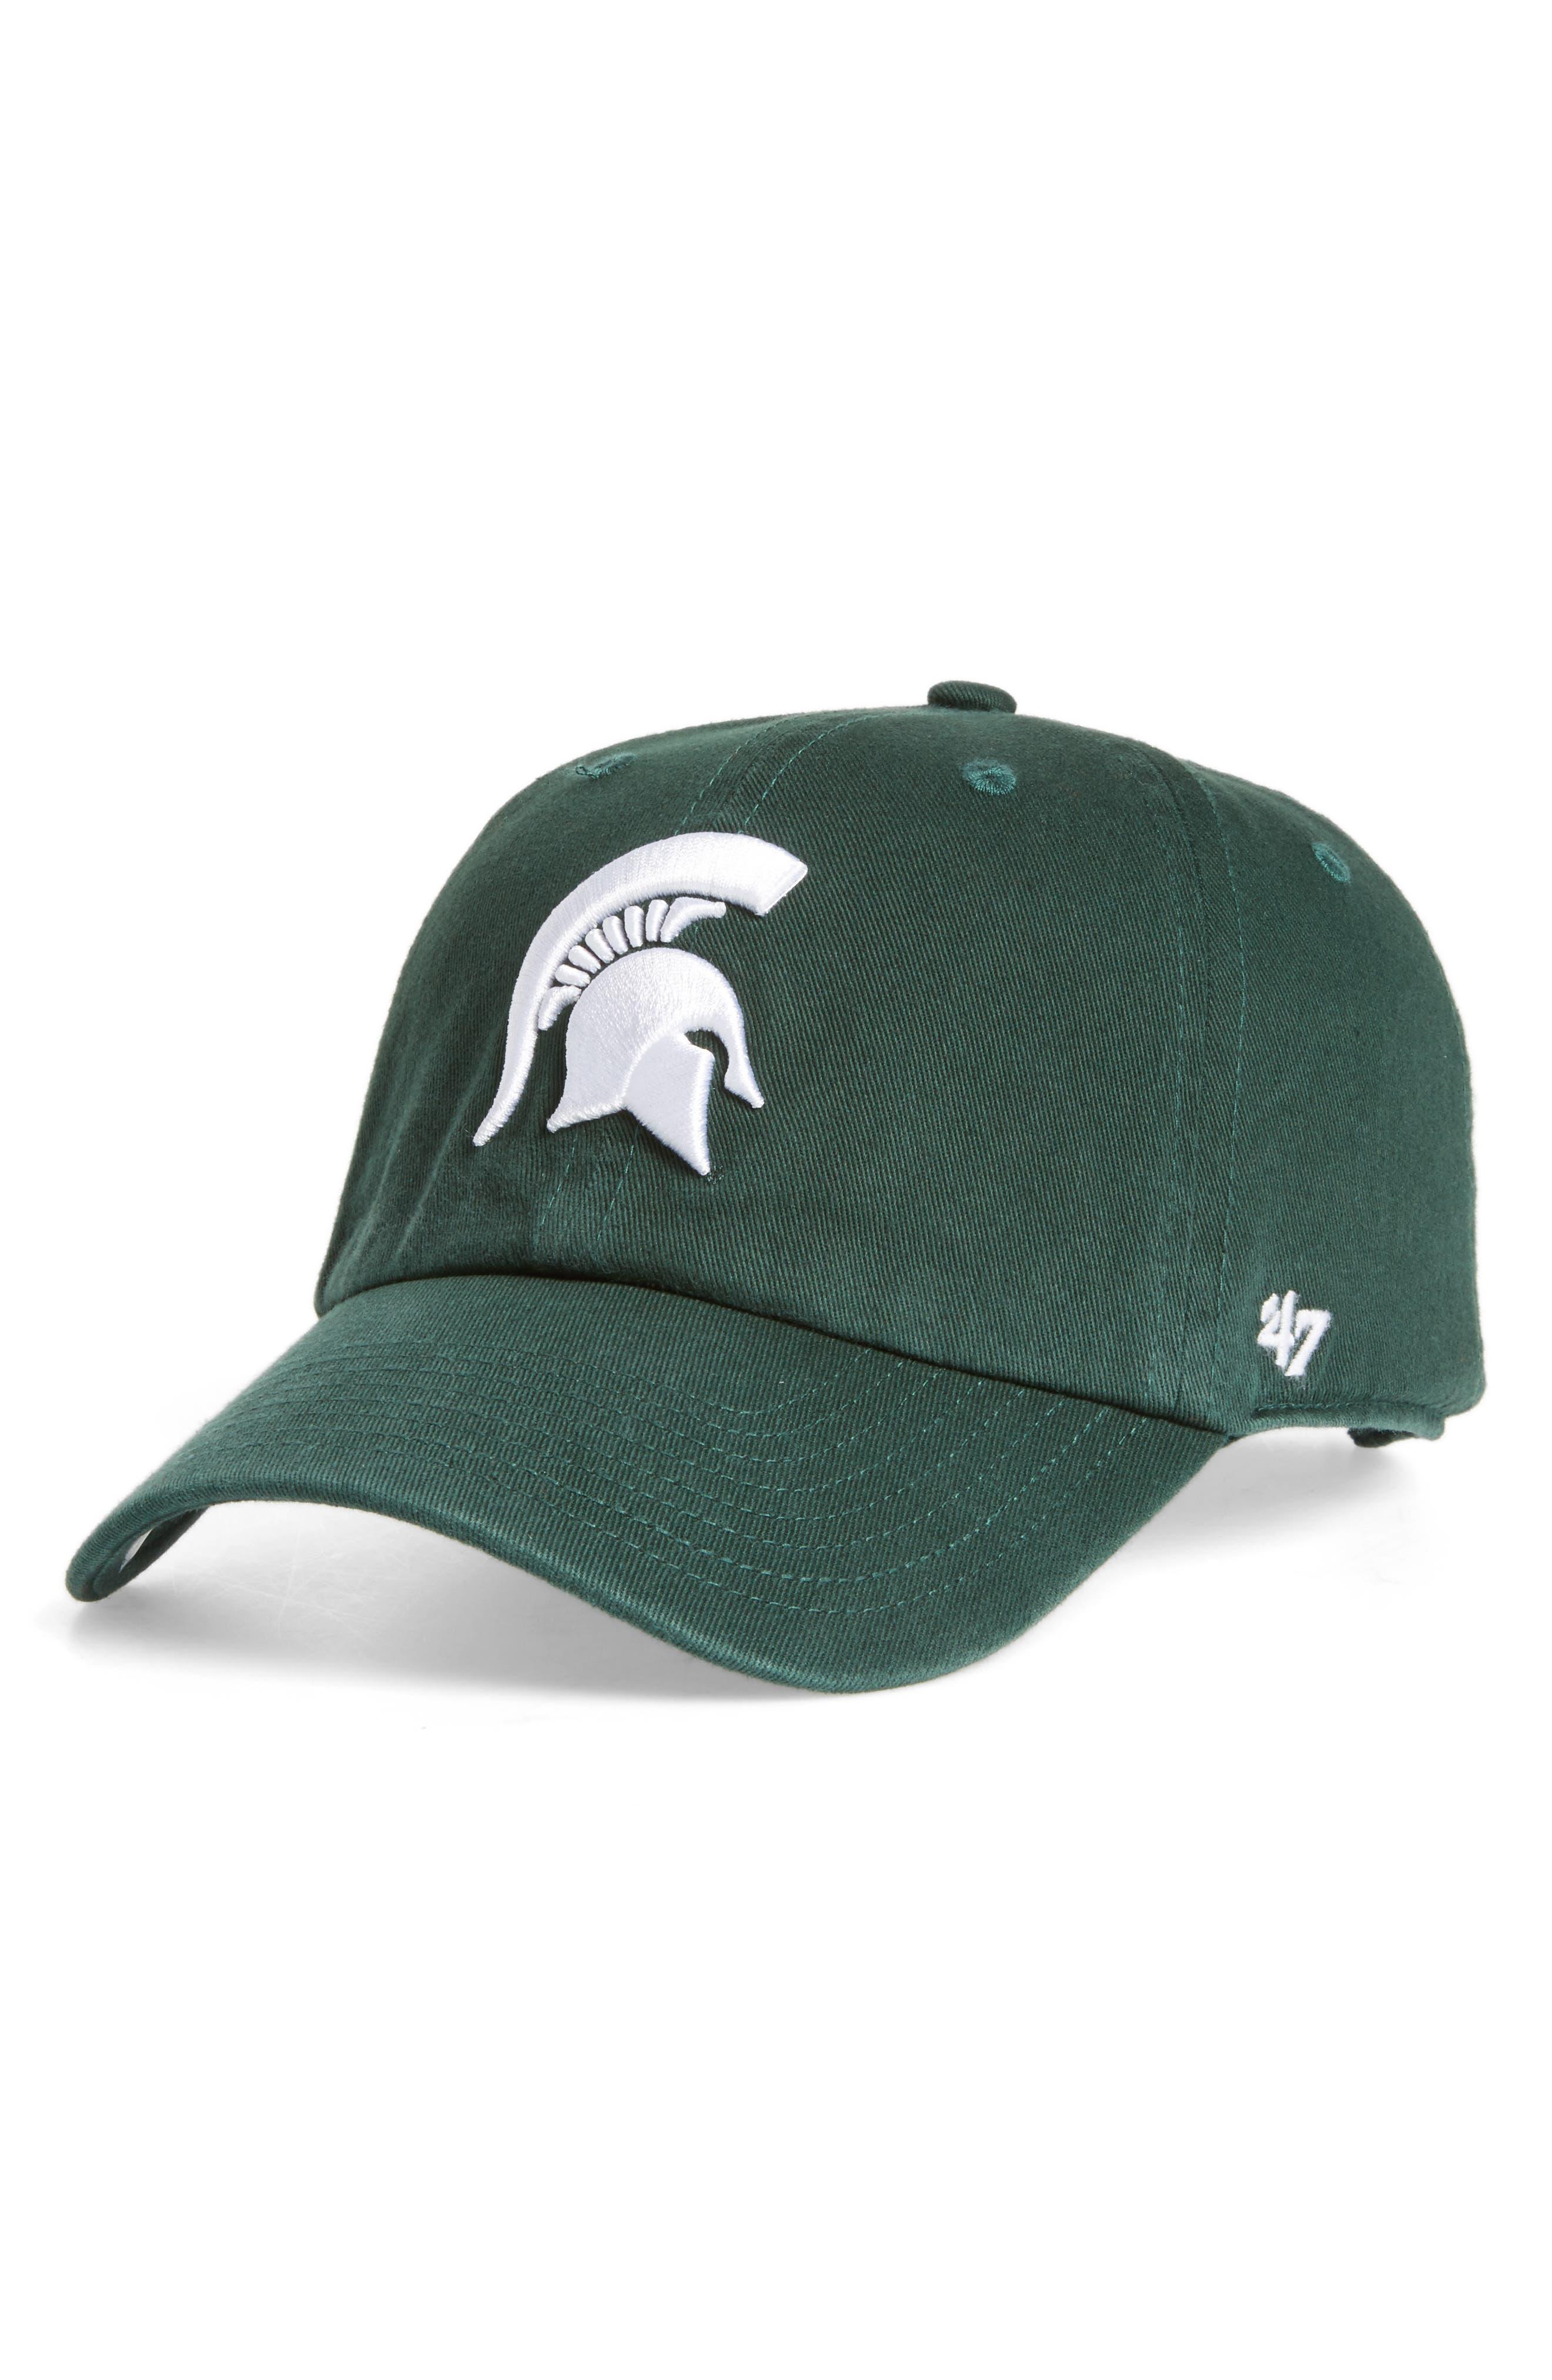 Main Image - '47 Michigan State Clean Up Baseball Cap